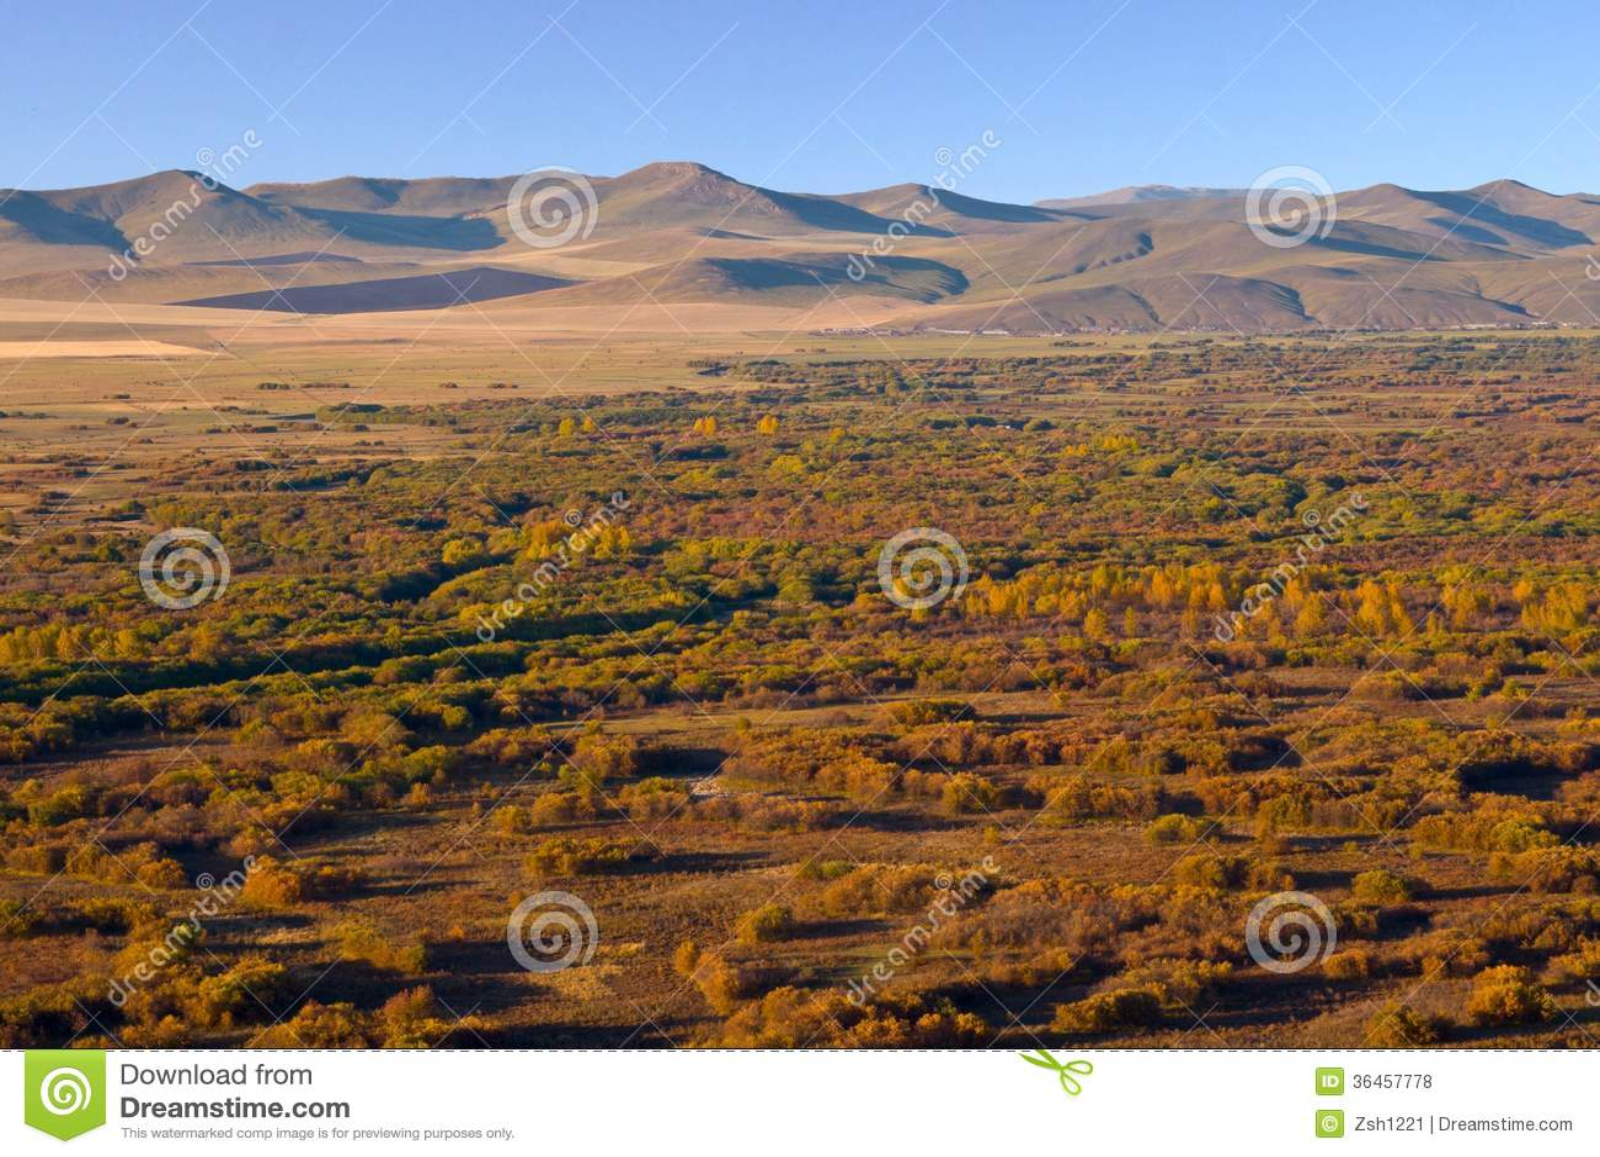 Hulun Buir China  city photos : Inner Mongolia Grassland Royalty Free Stock Photos Image: 36457778